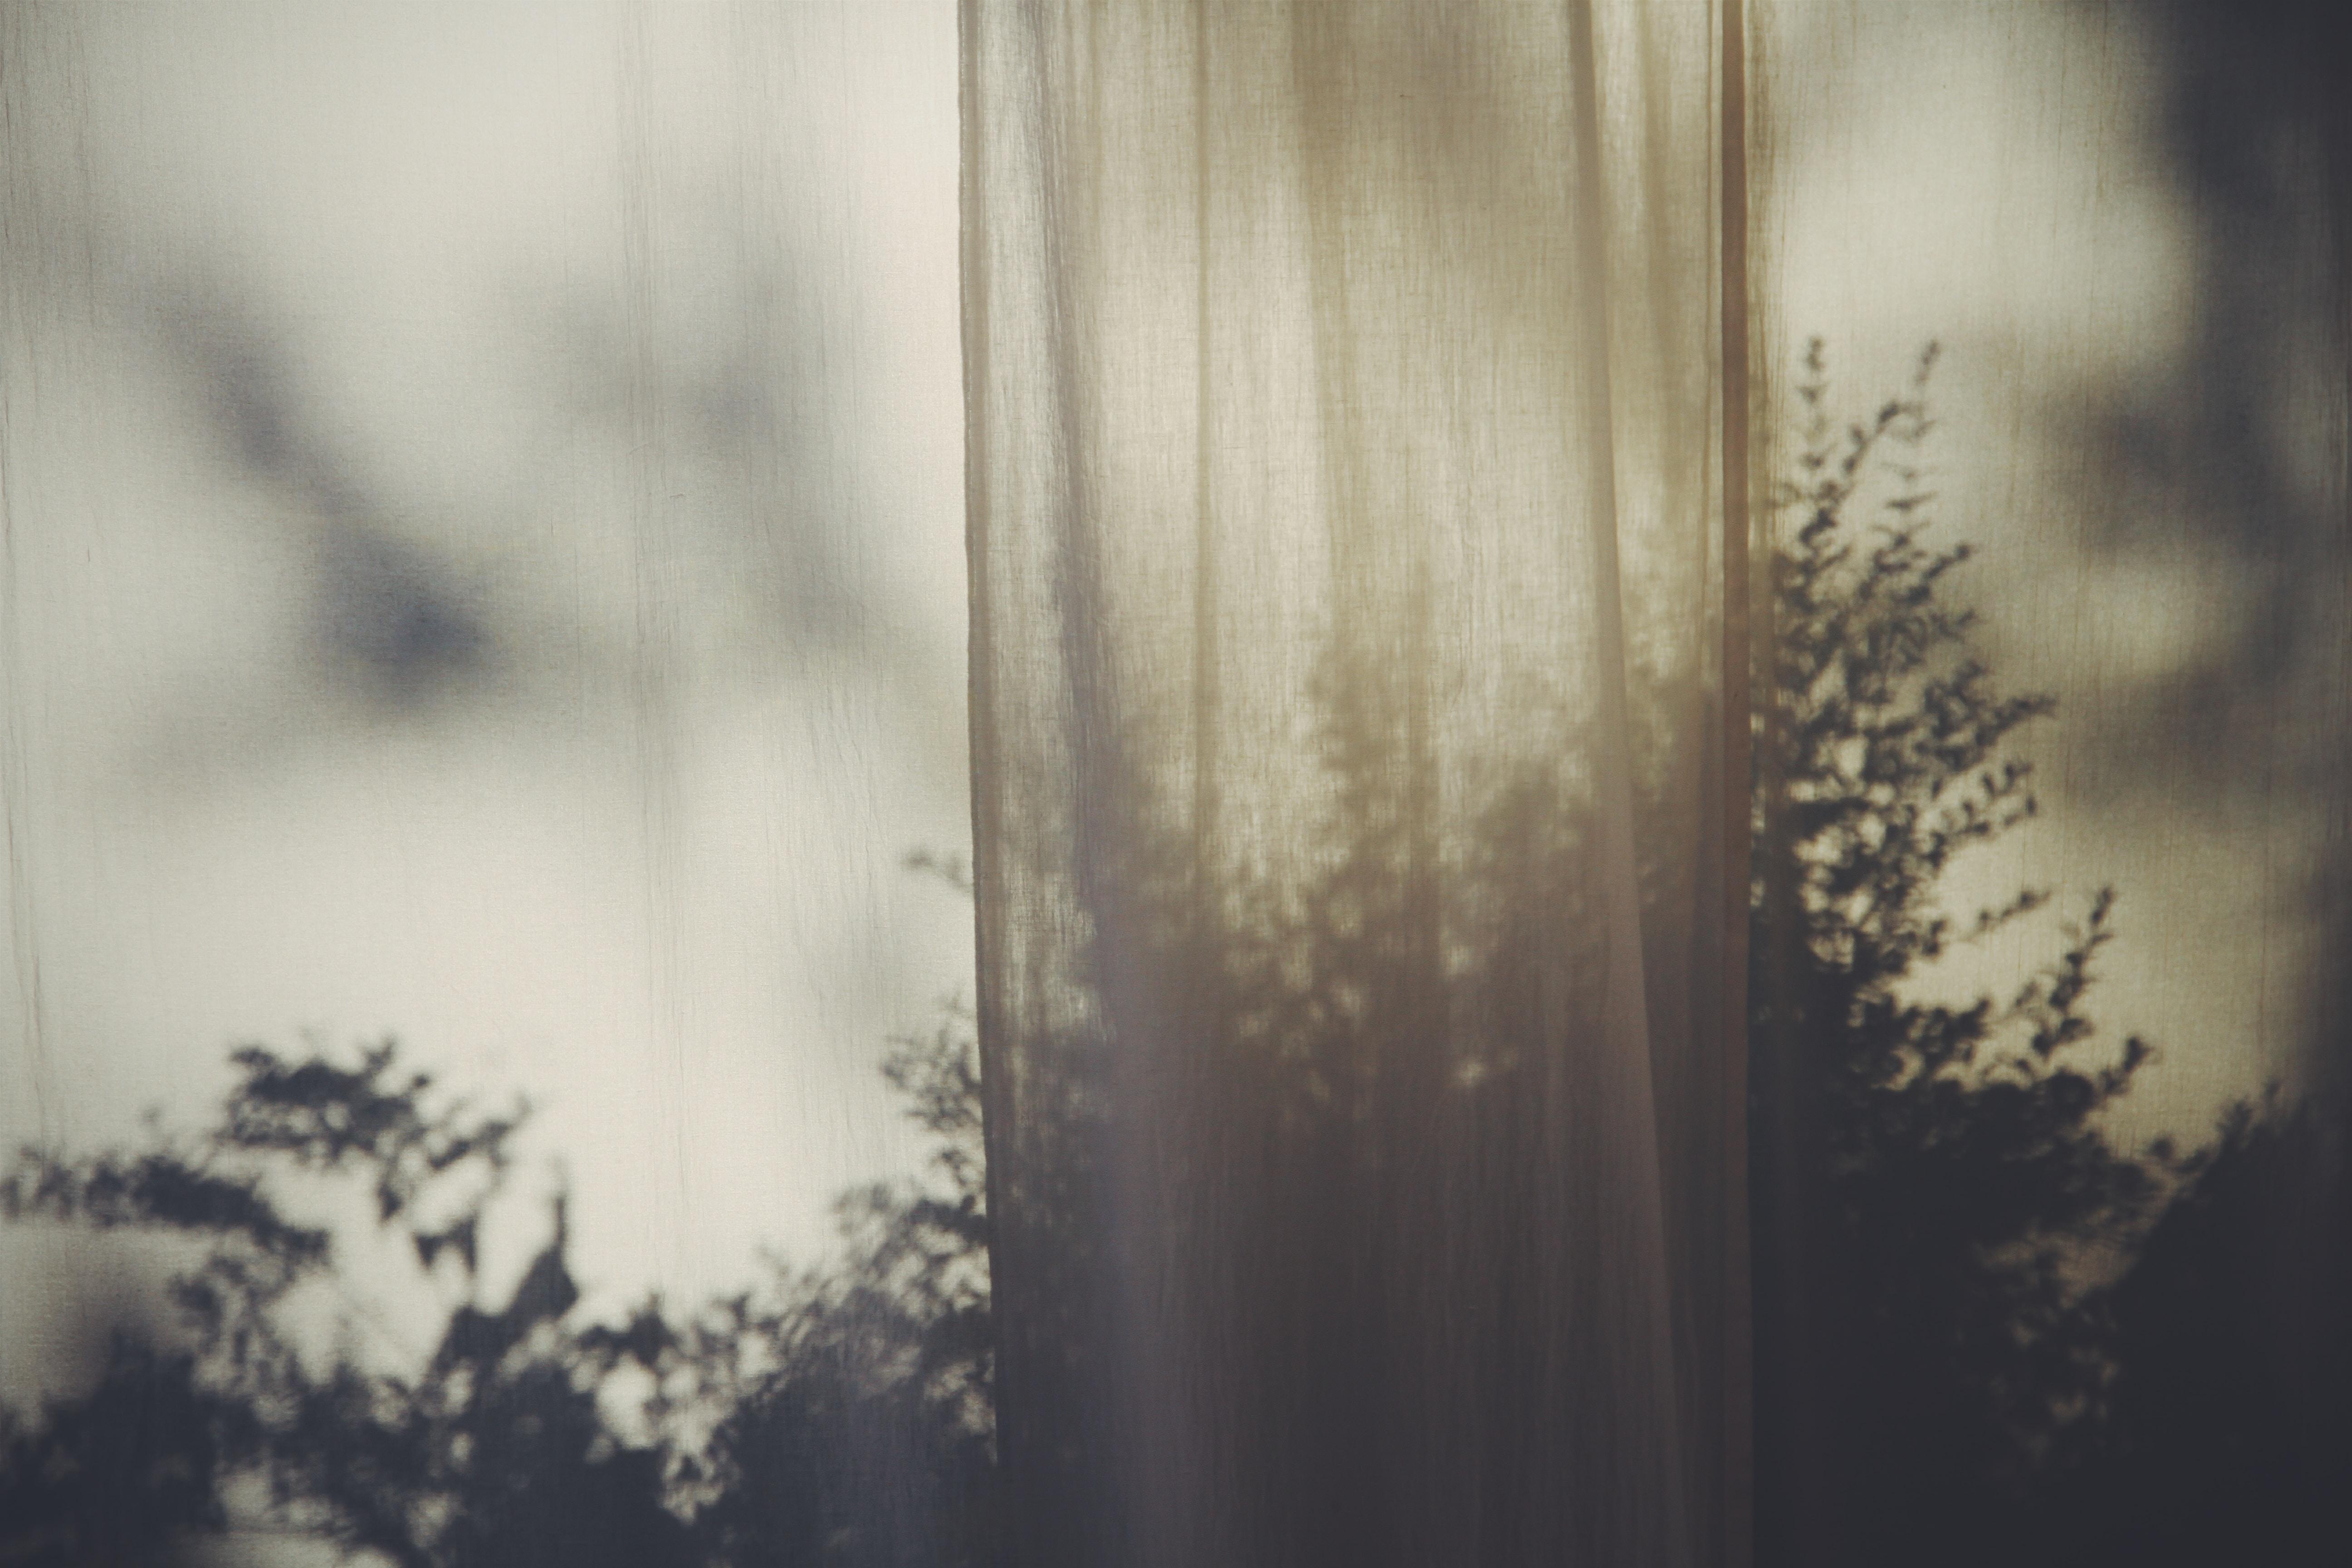 mesh curtain near tree